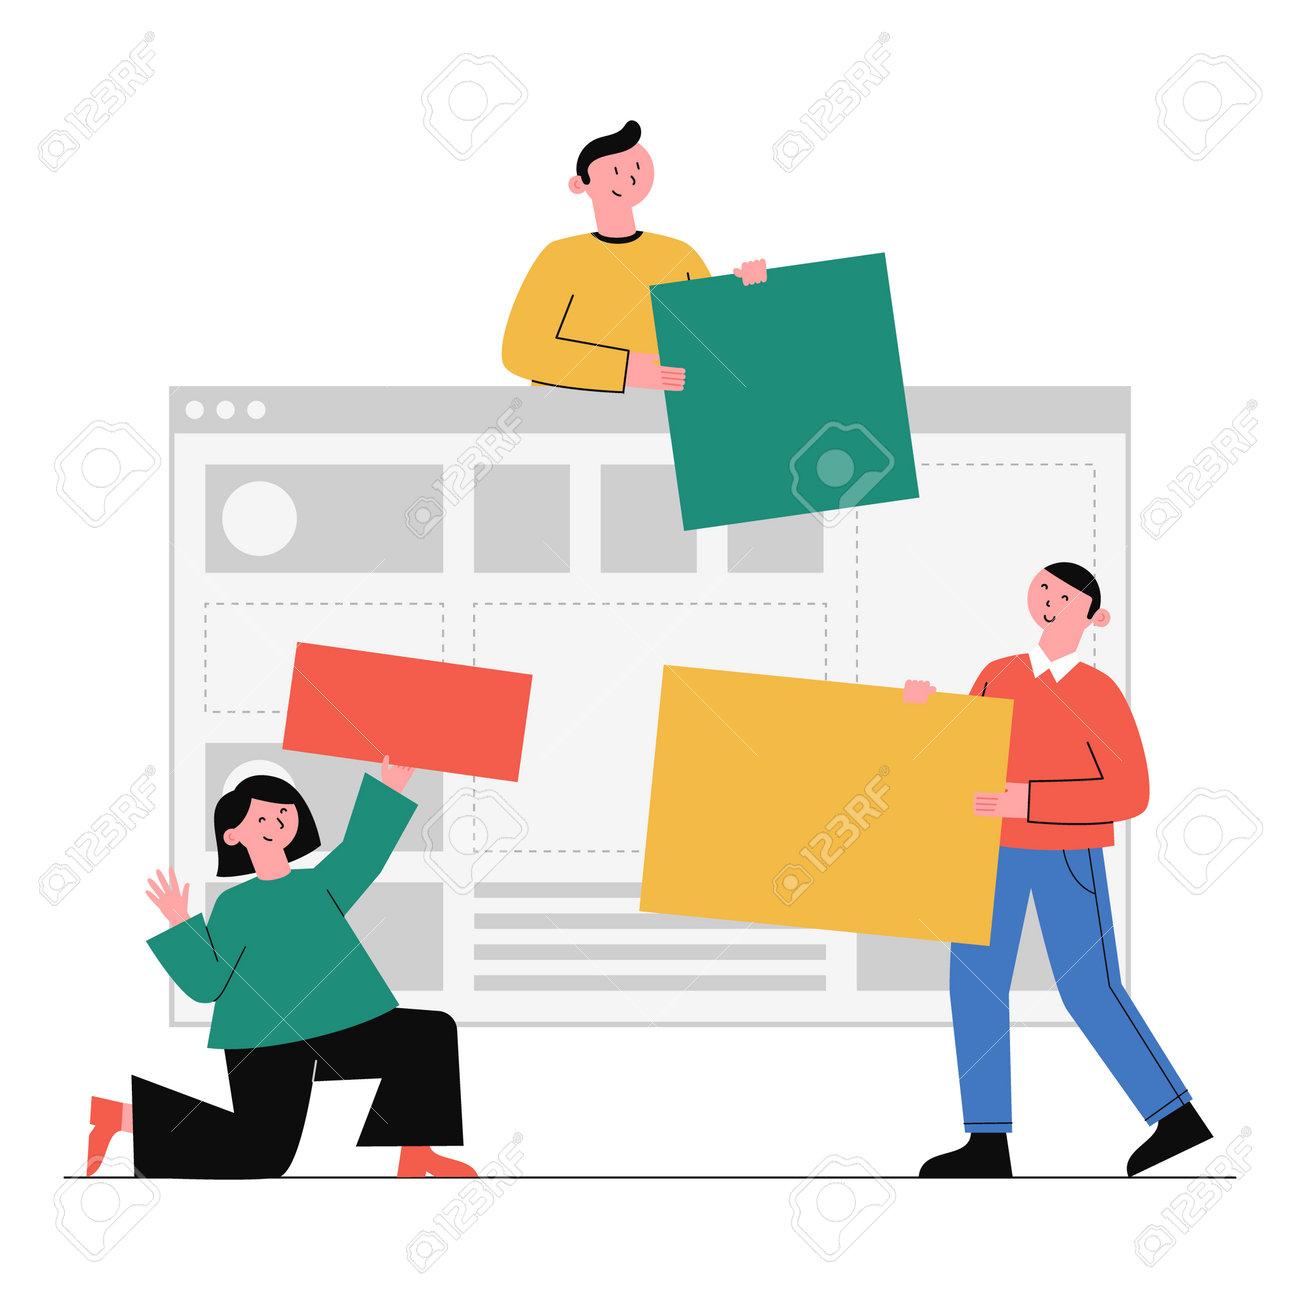 Business concept vector illustration. - 162422136